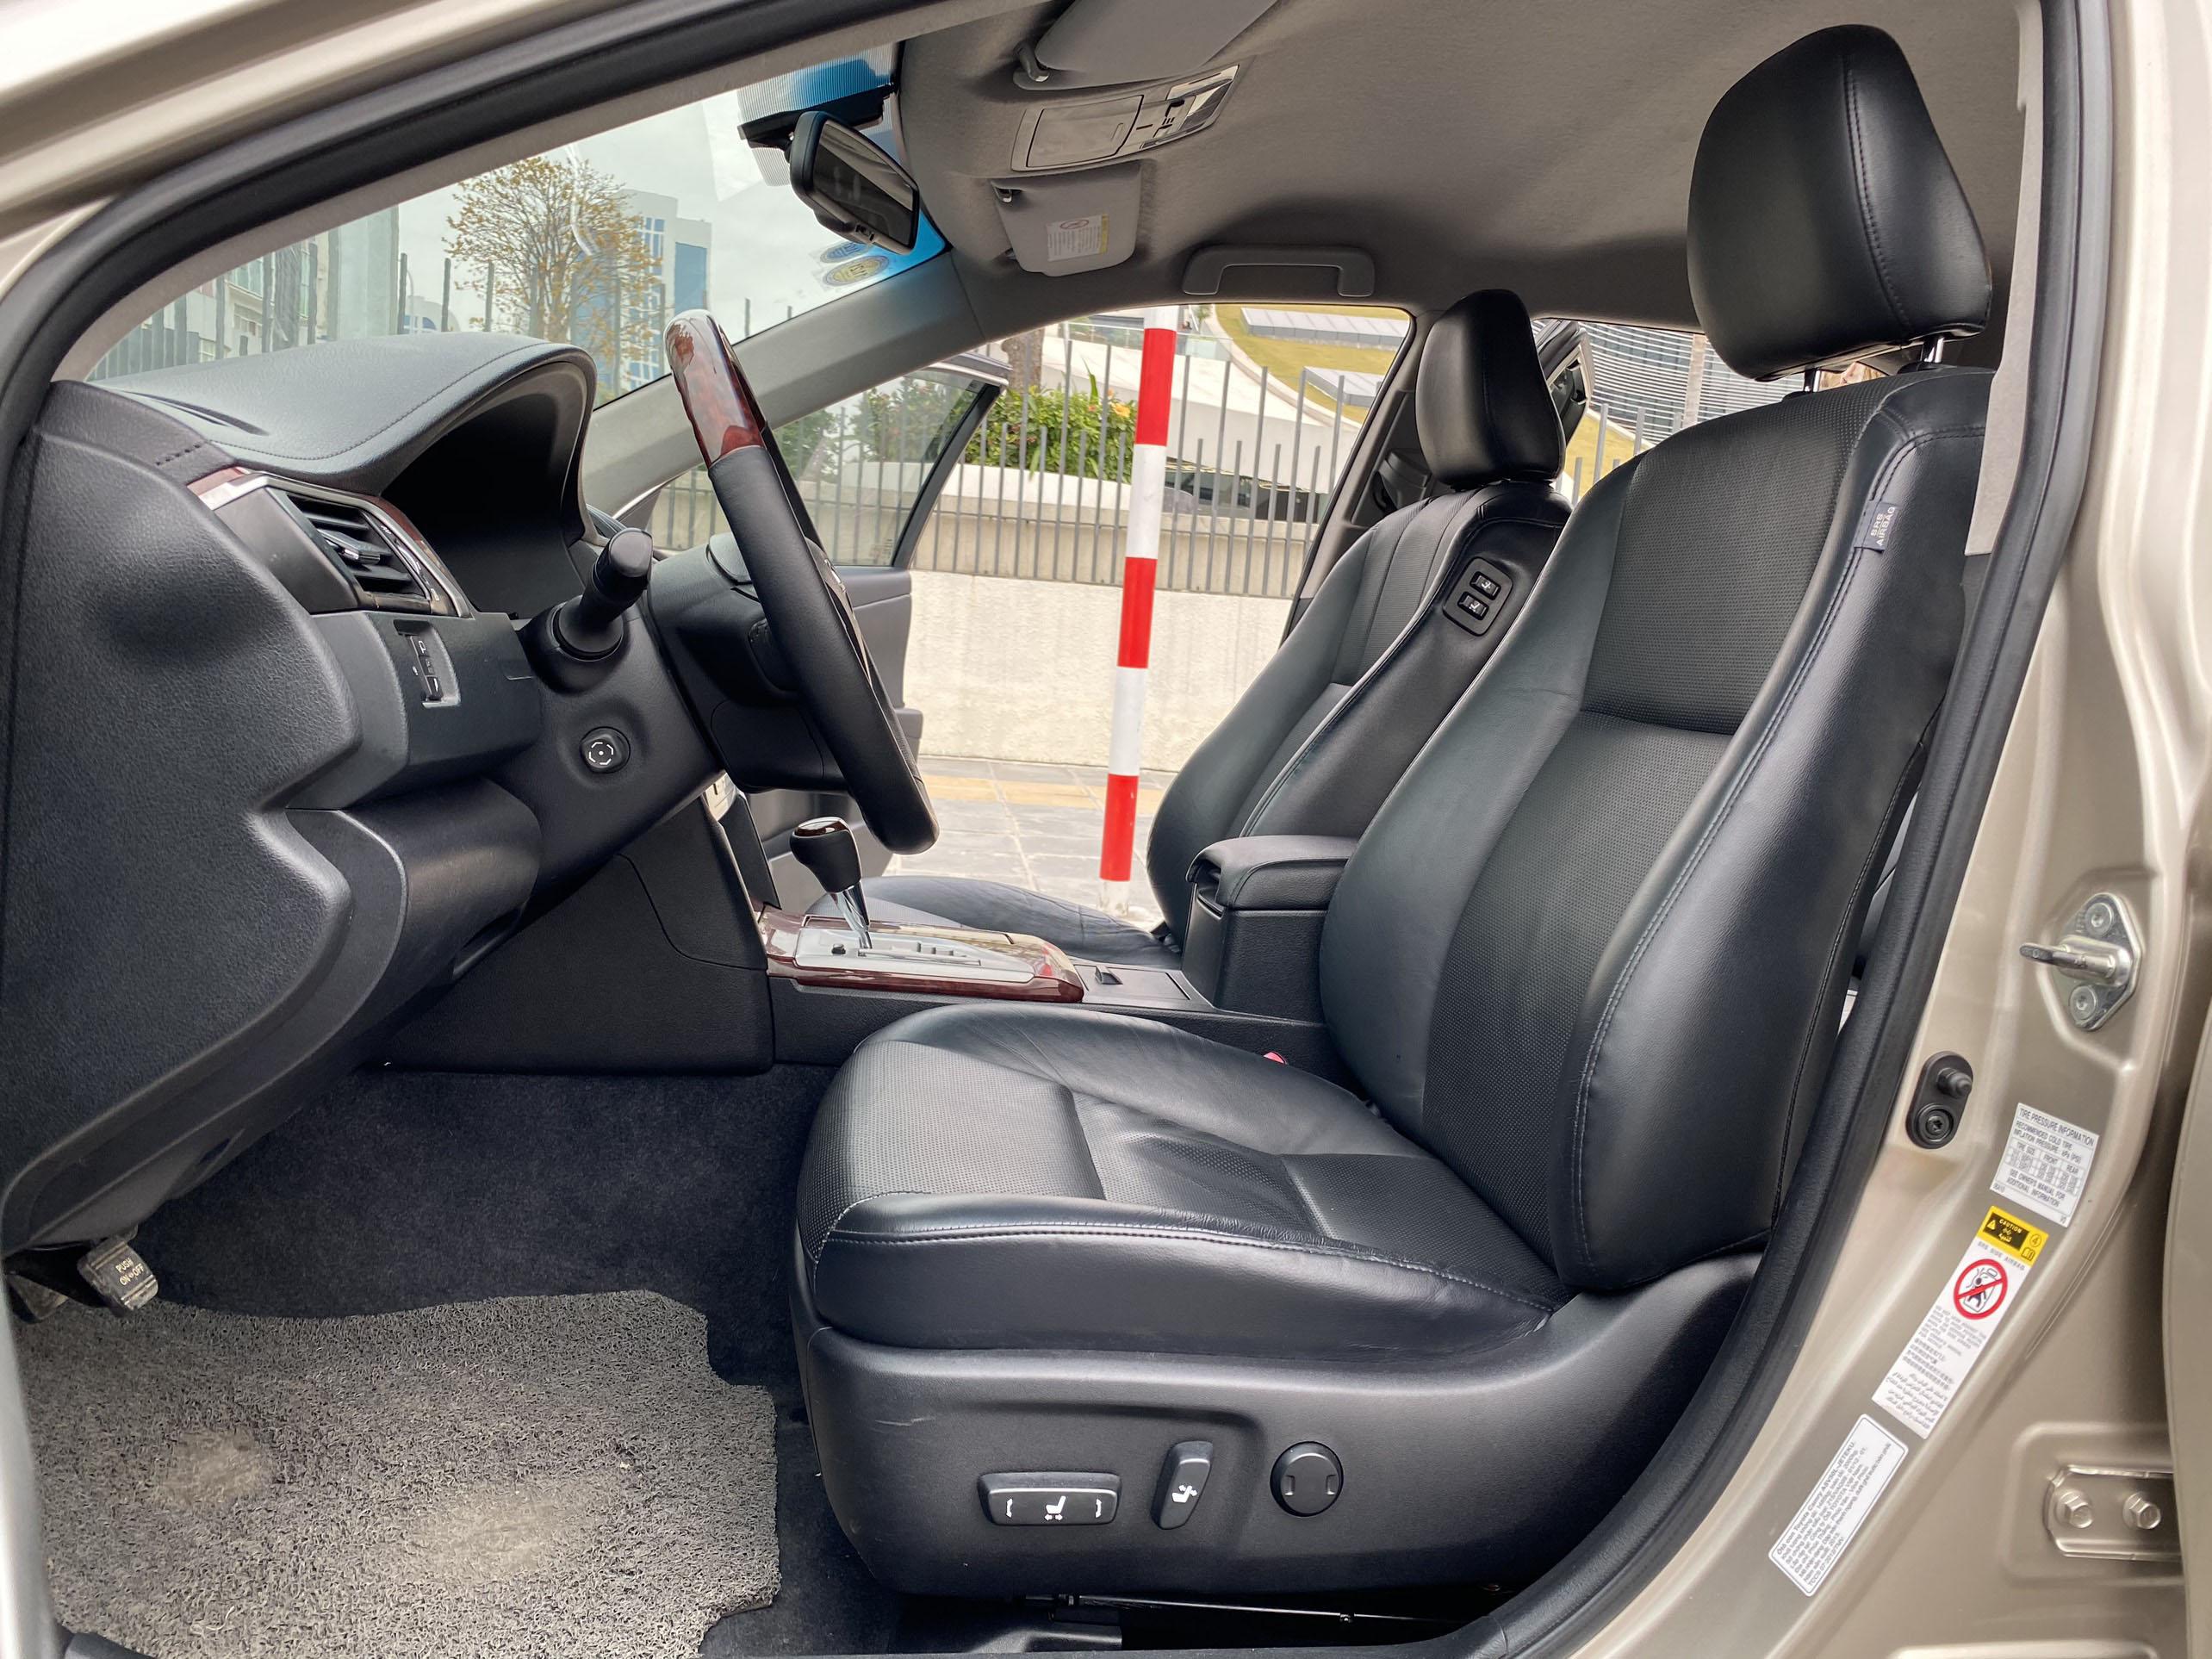 Toyota Camry 2.5Q Sx 2013